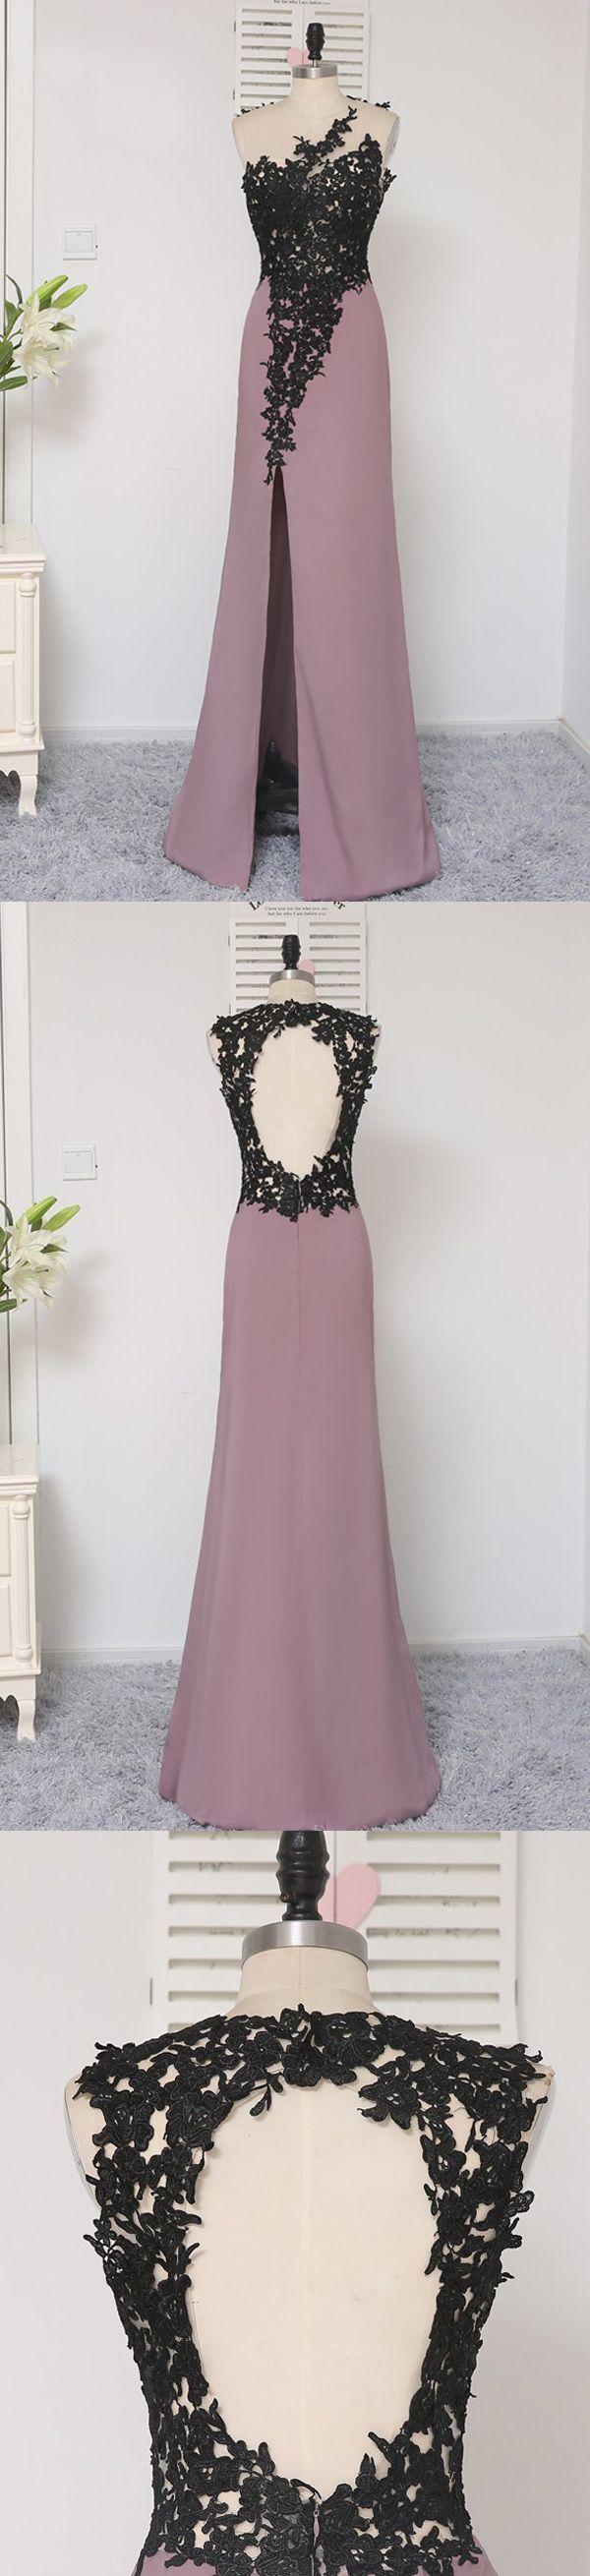 Long Prom Dresses, Sleeveless Prom Dresses, Satin Party Prom Dresses, Open Back Prom Dresses, Side Split Mermaid Prom Dresses, 17280